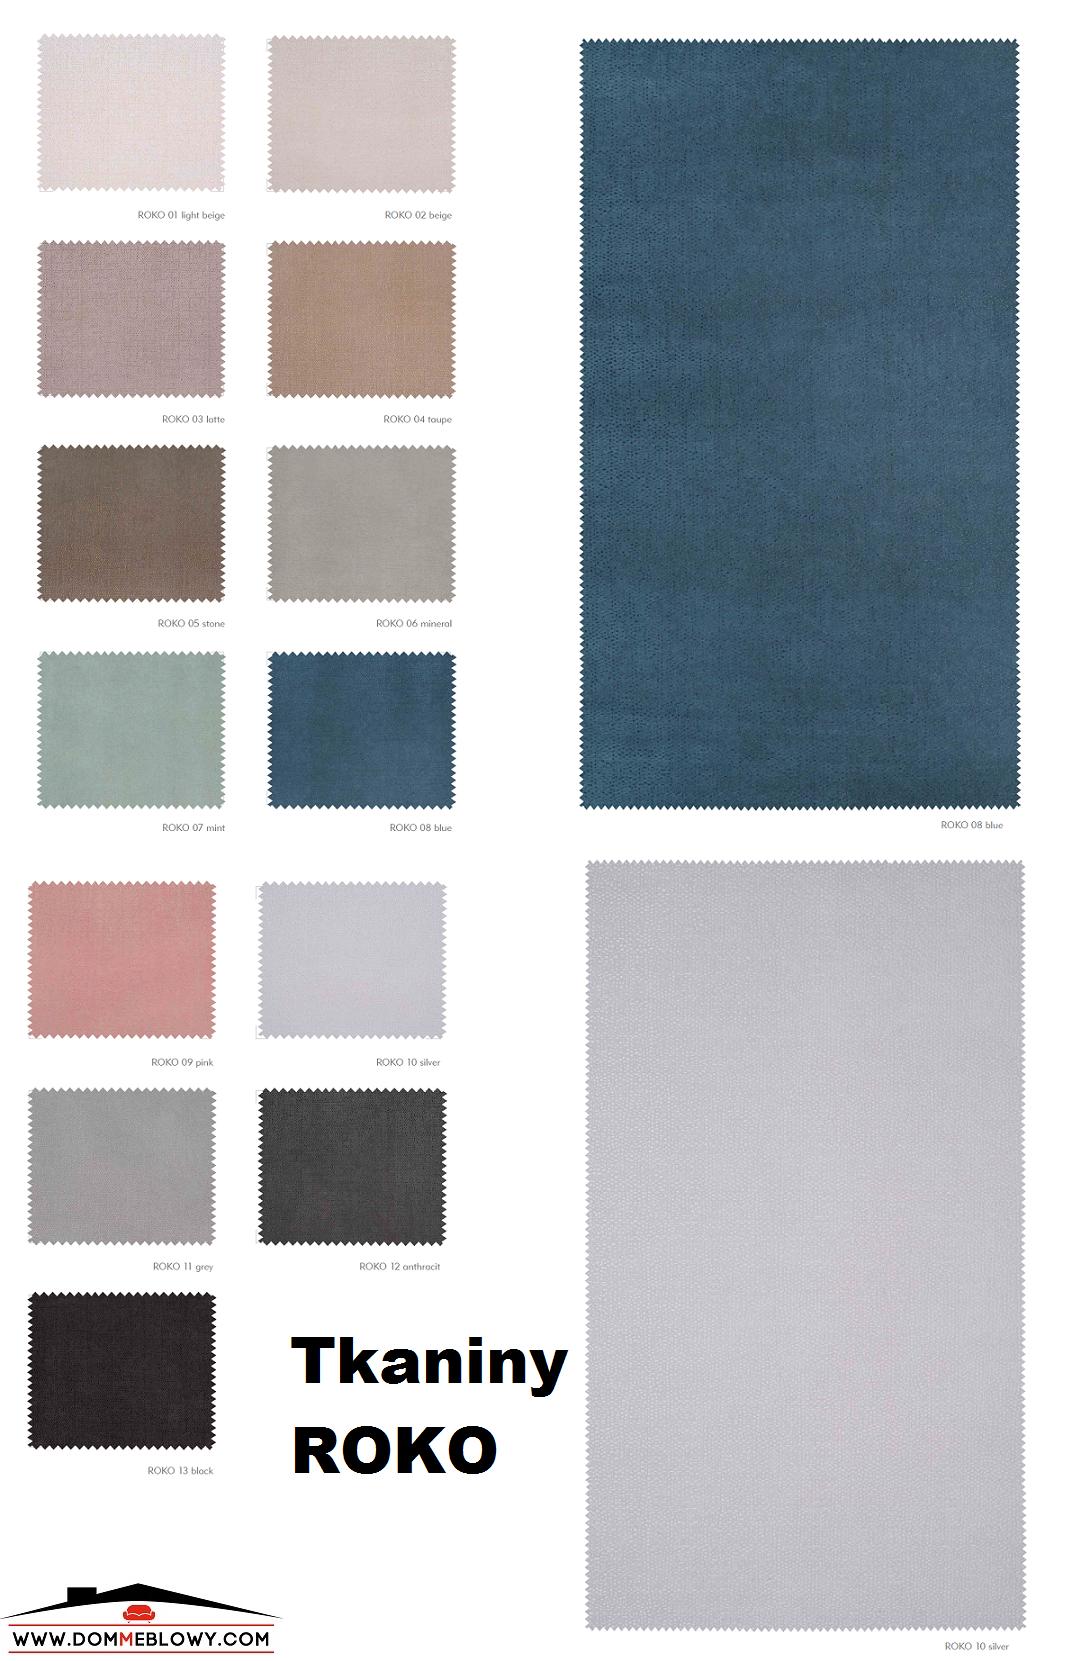 Tkaniny Rokko dla mebli tapicerowanych producenta Meblosoft